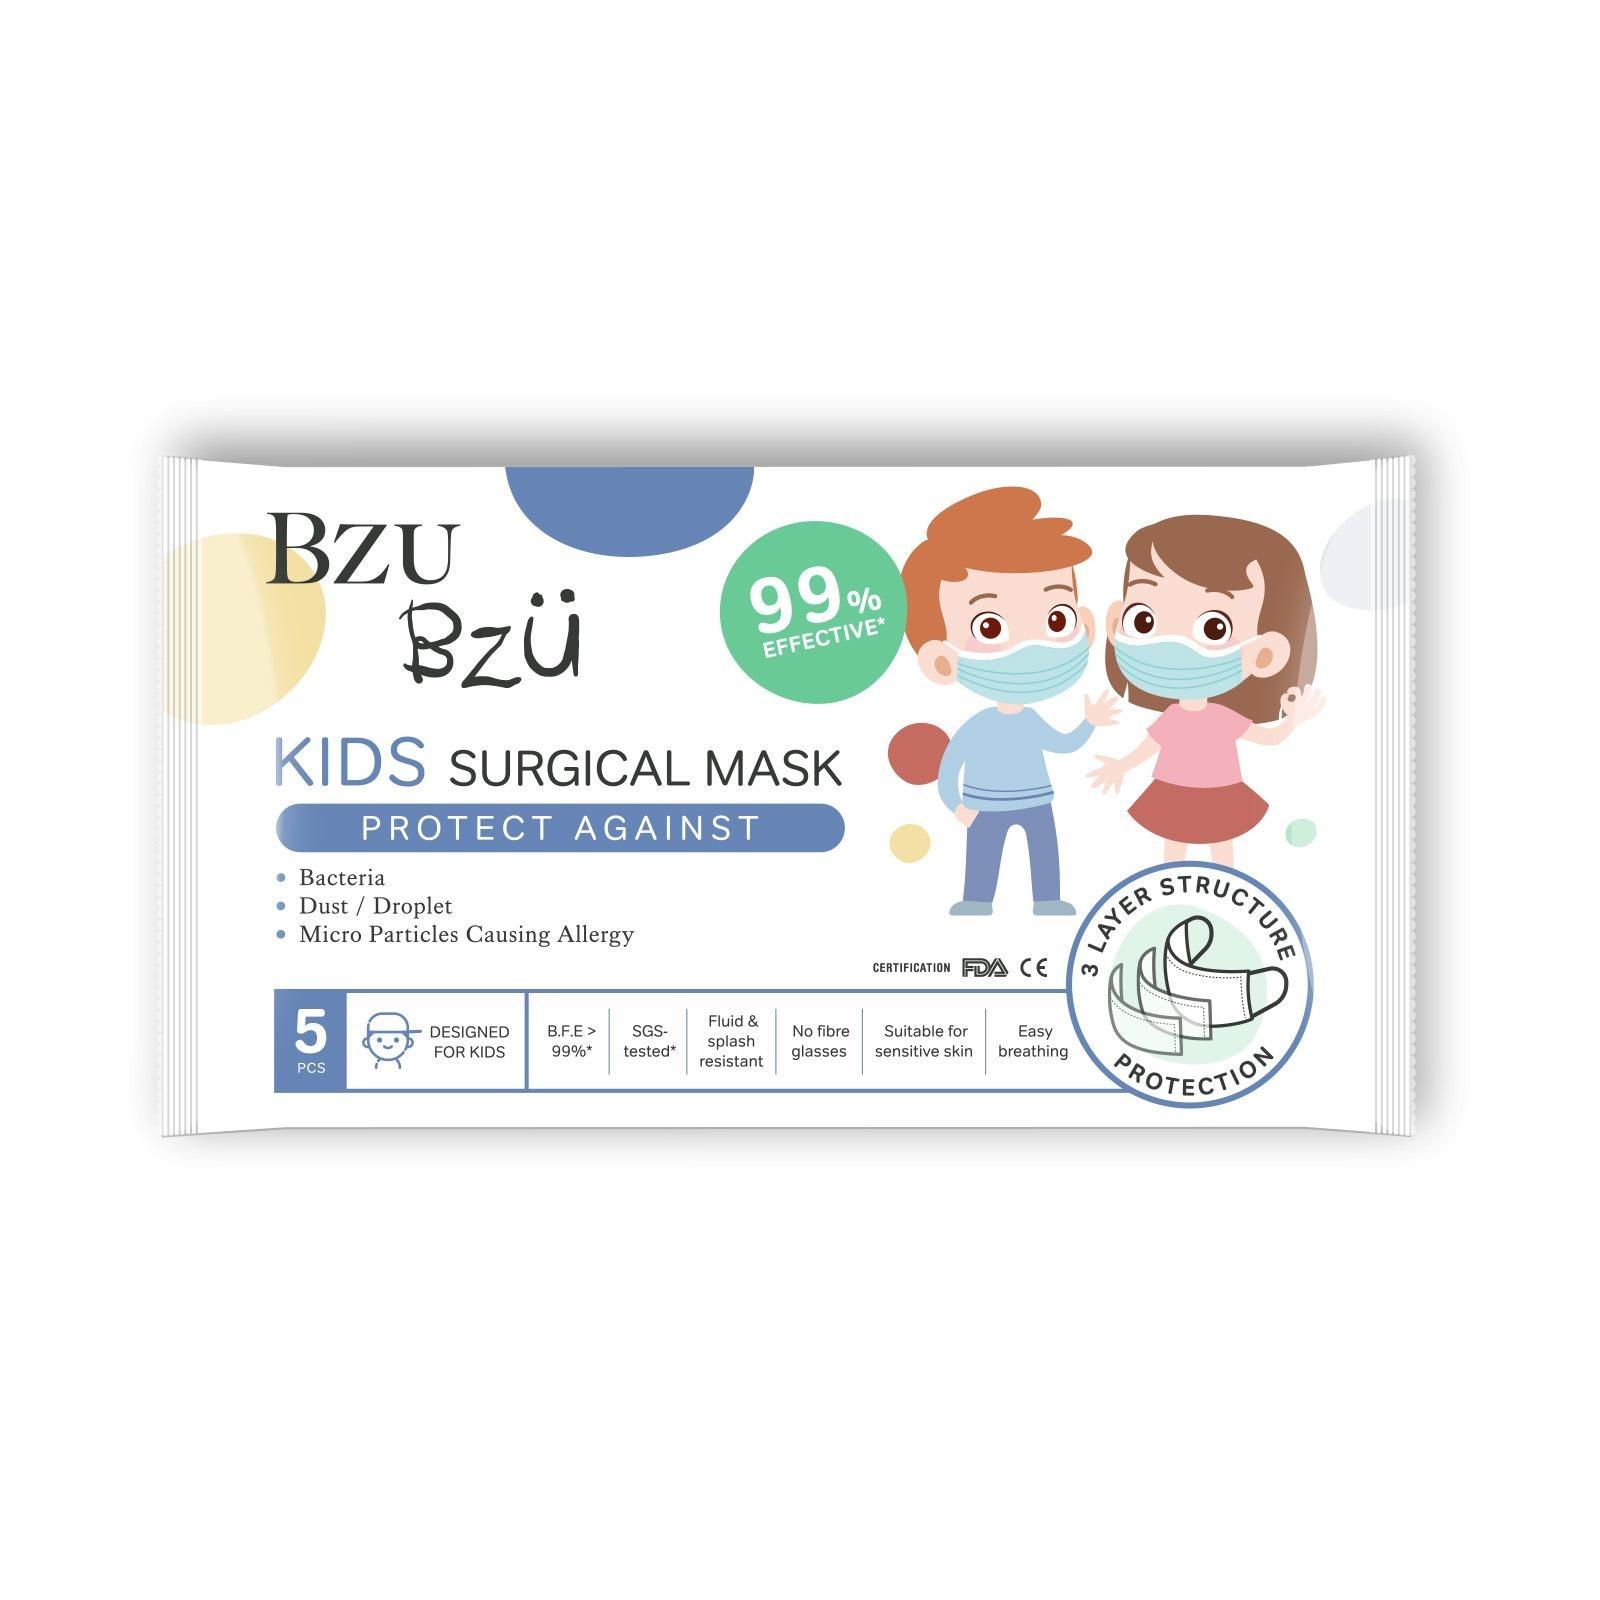 BZU BZU Kids Medical Surgical Disposable Mask 5s